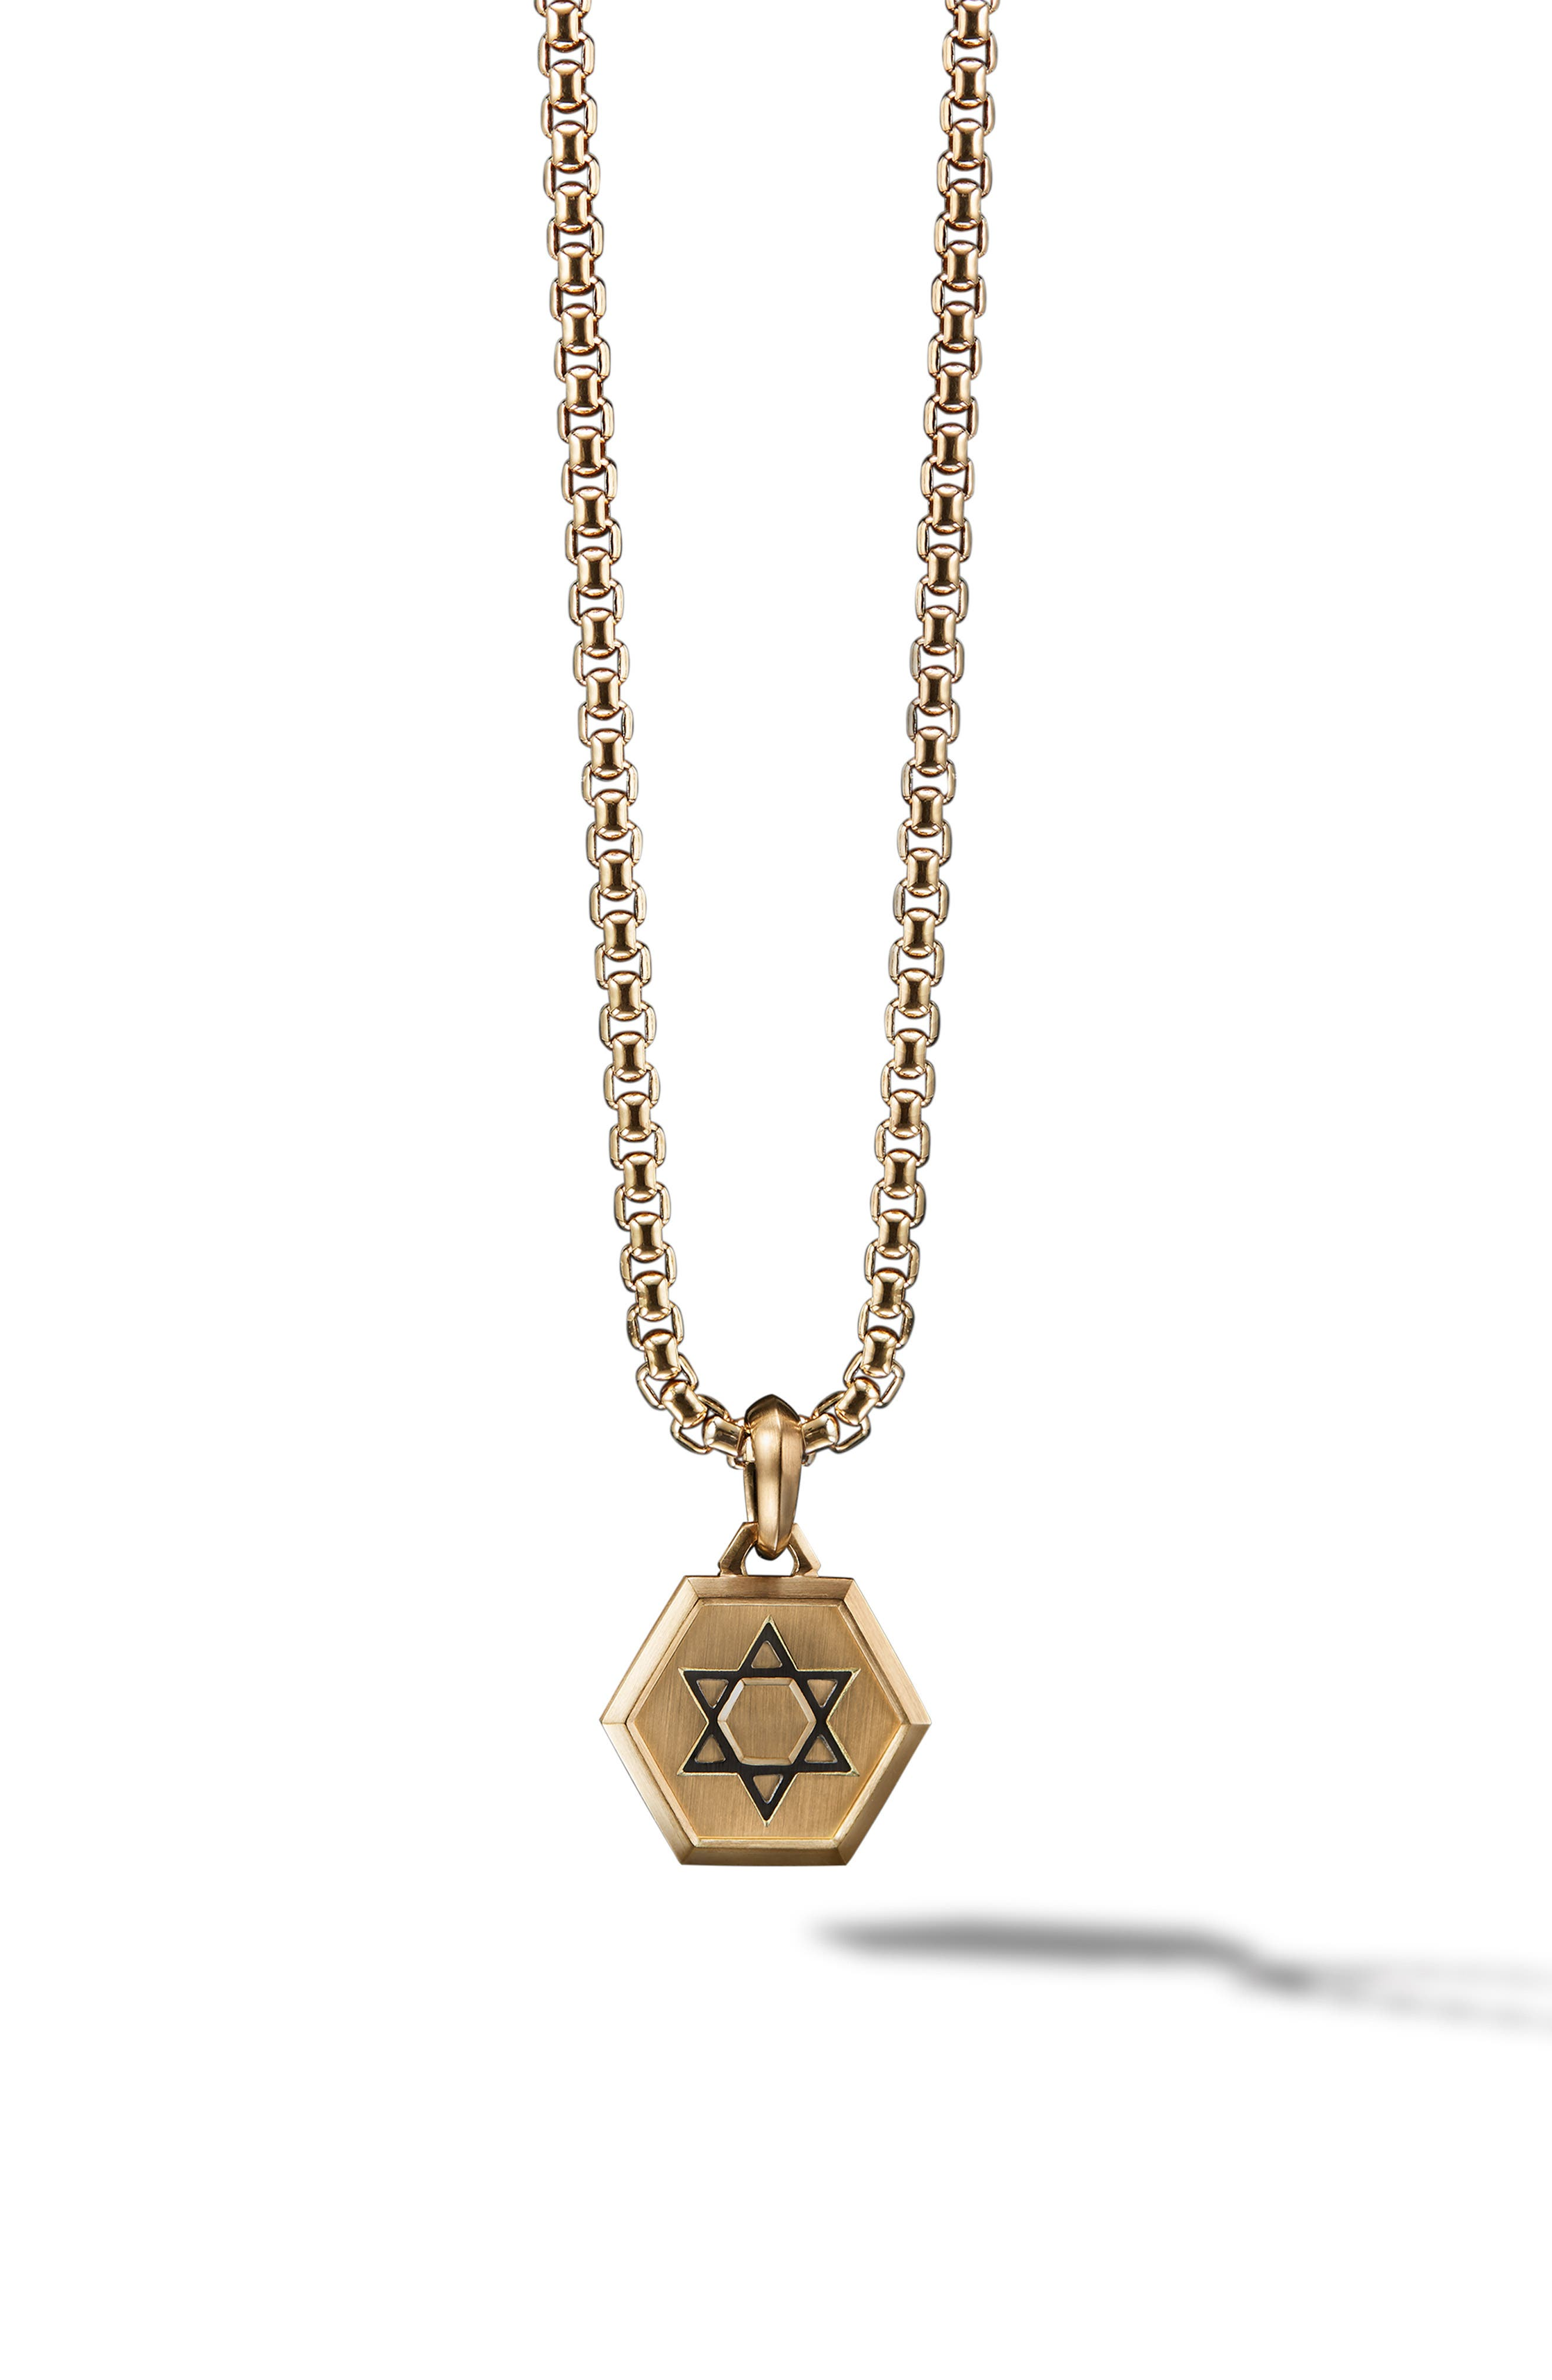 Star of David 18K Gold Amulet Enhancer,                             Main thumbnail 1, color,                             GOLD